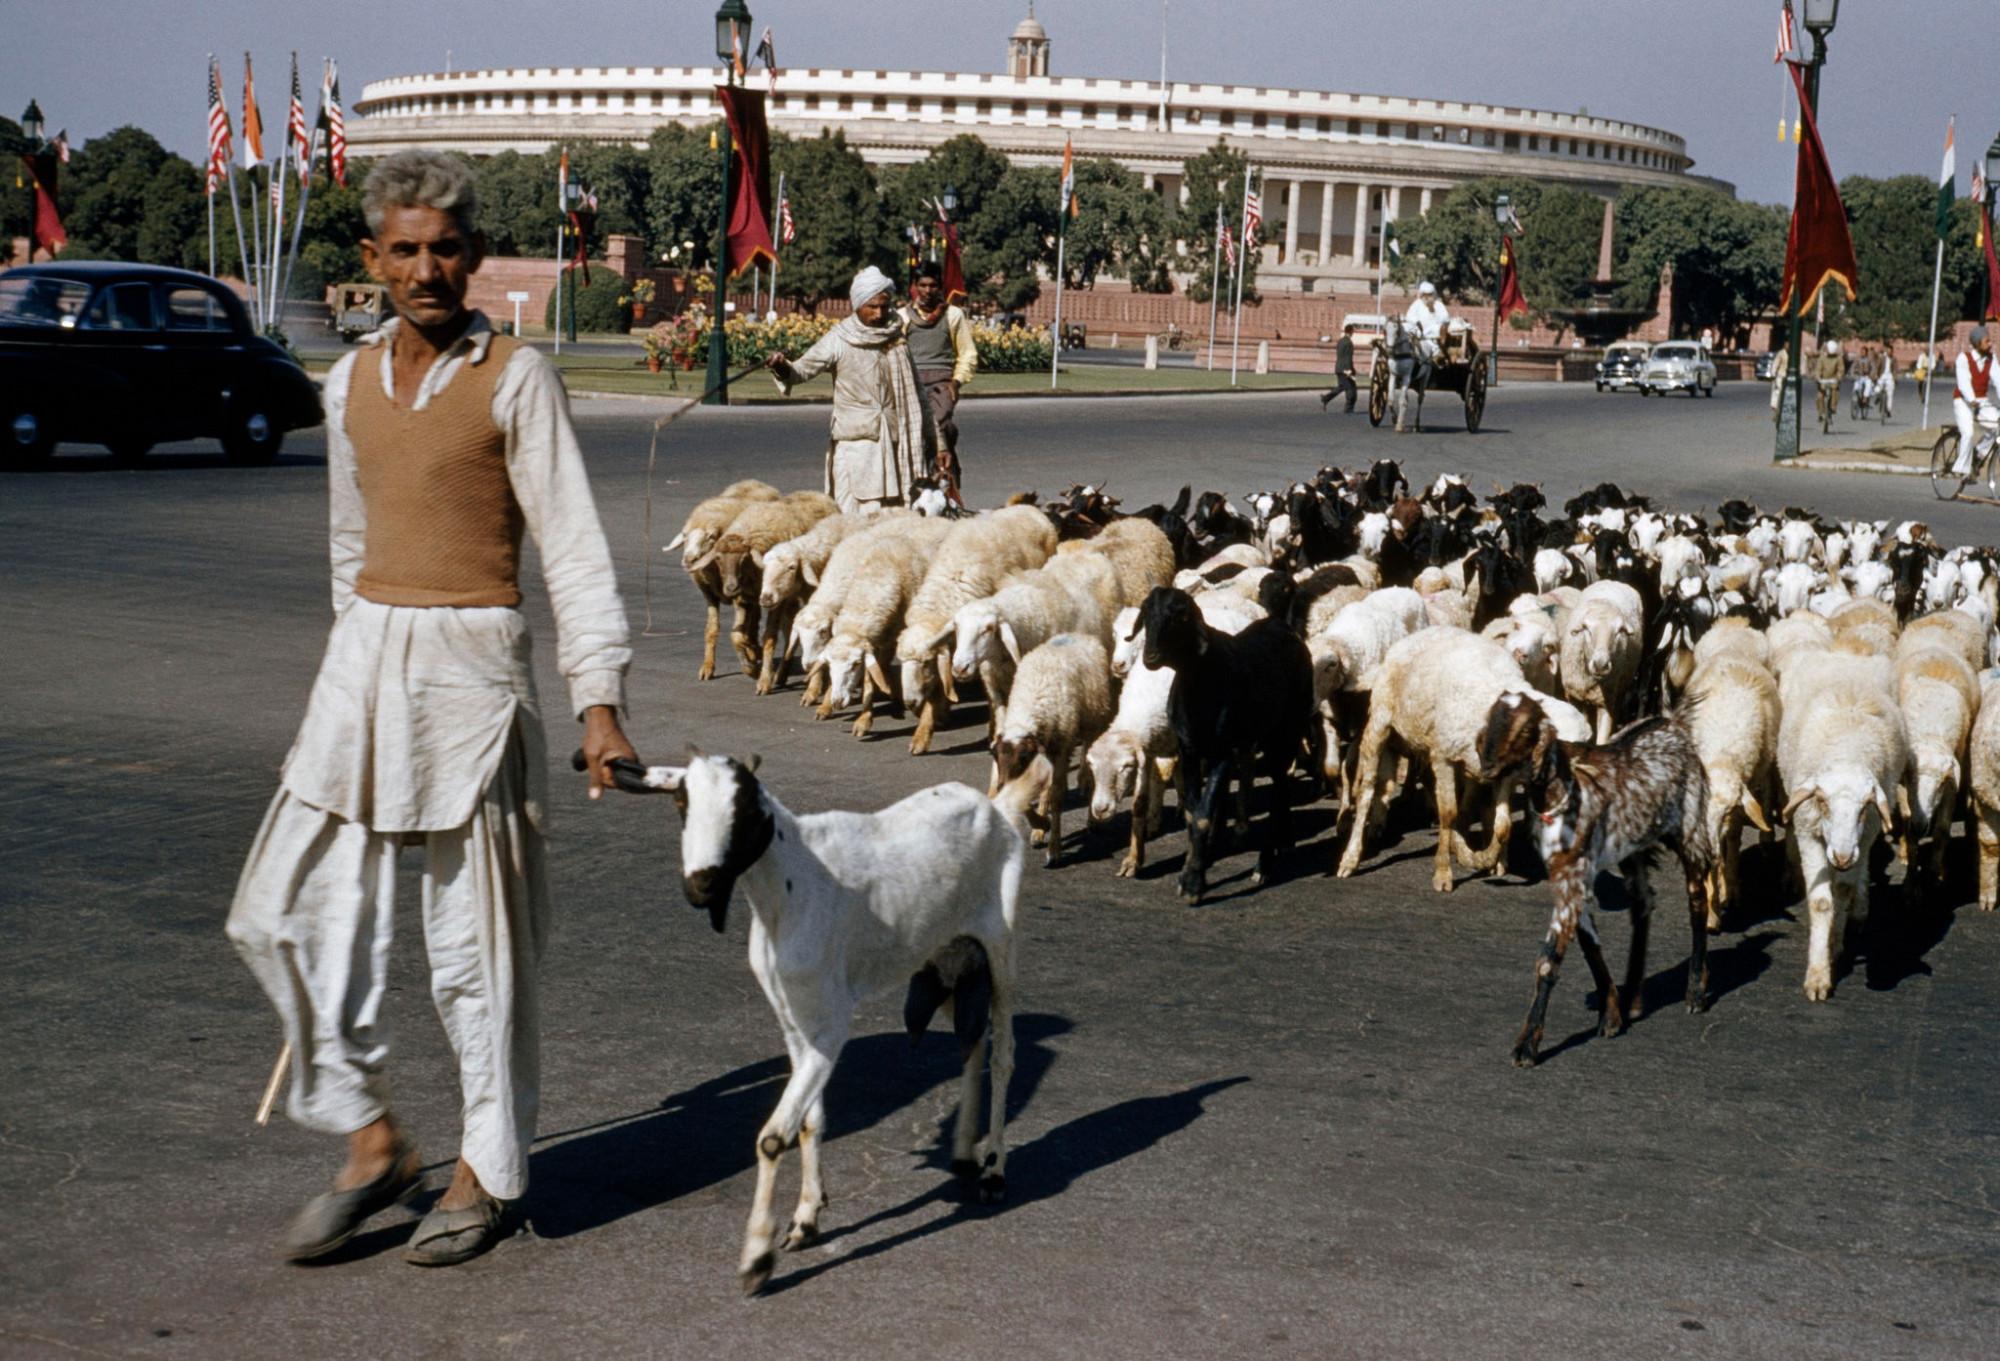 1960 Delhi by Herbert S. Wilburn Jr.